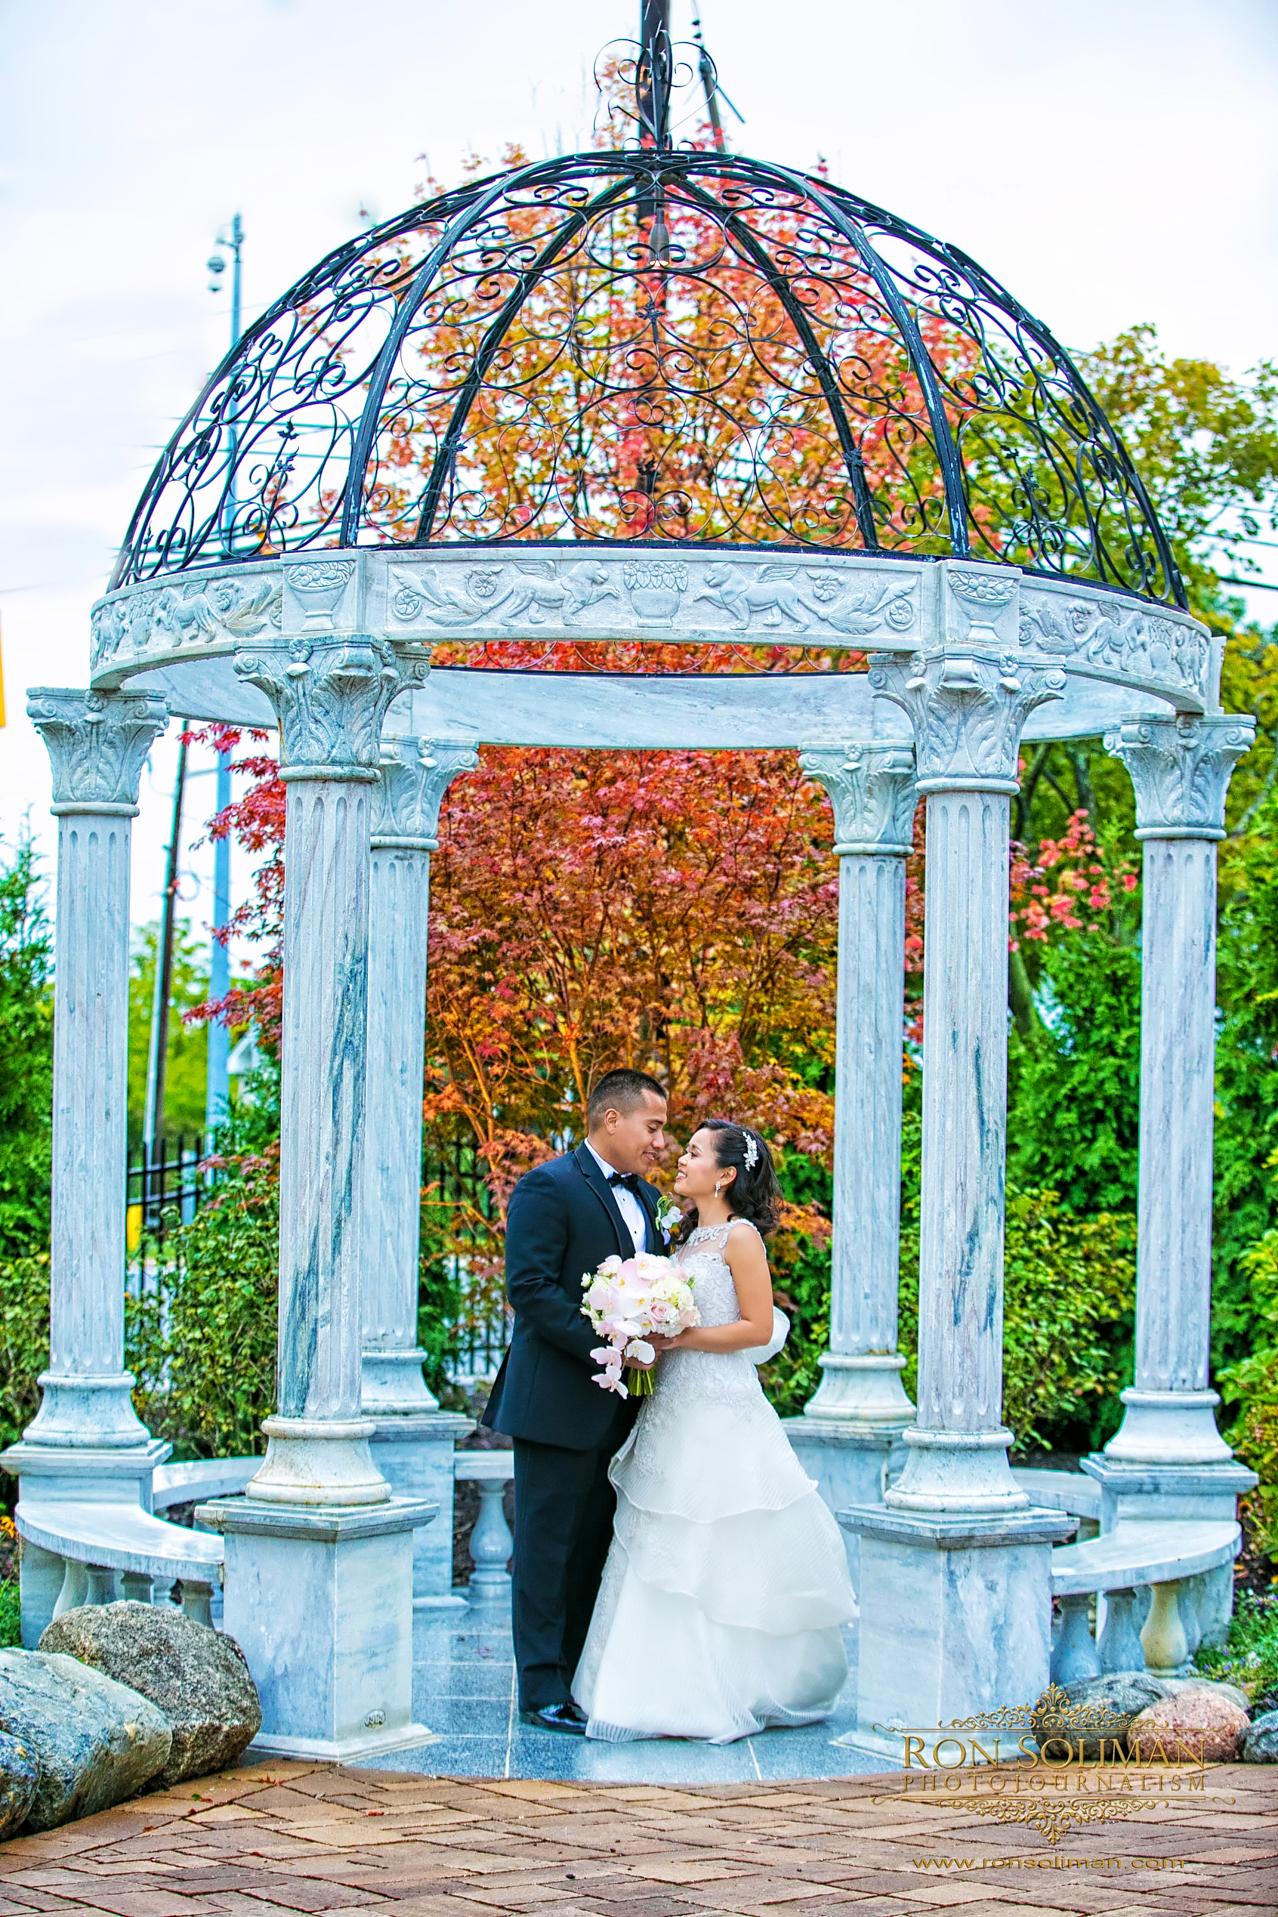 THE WATERFALL Wedding 18